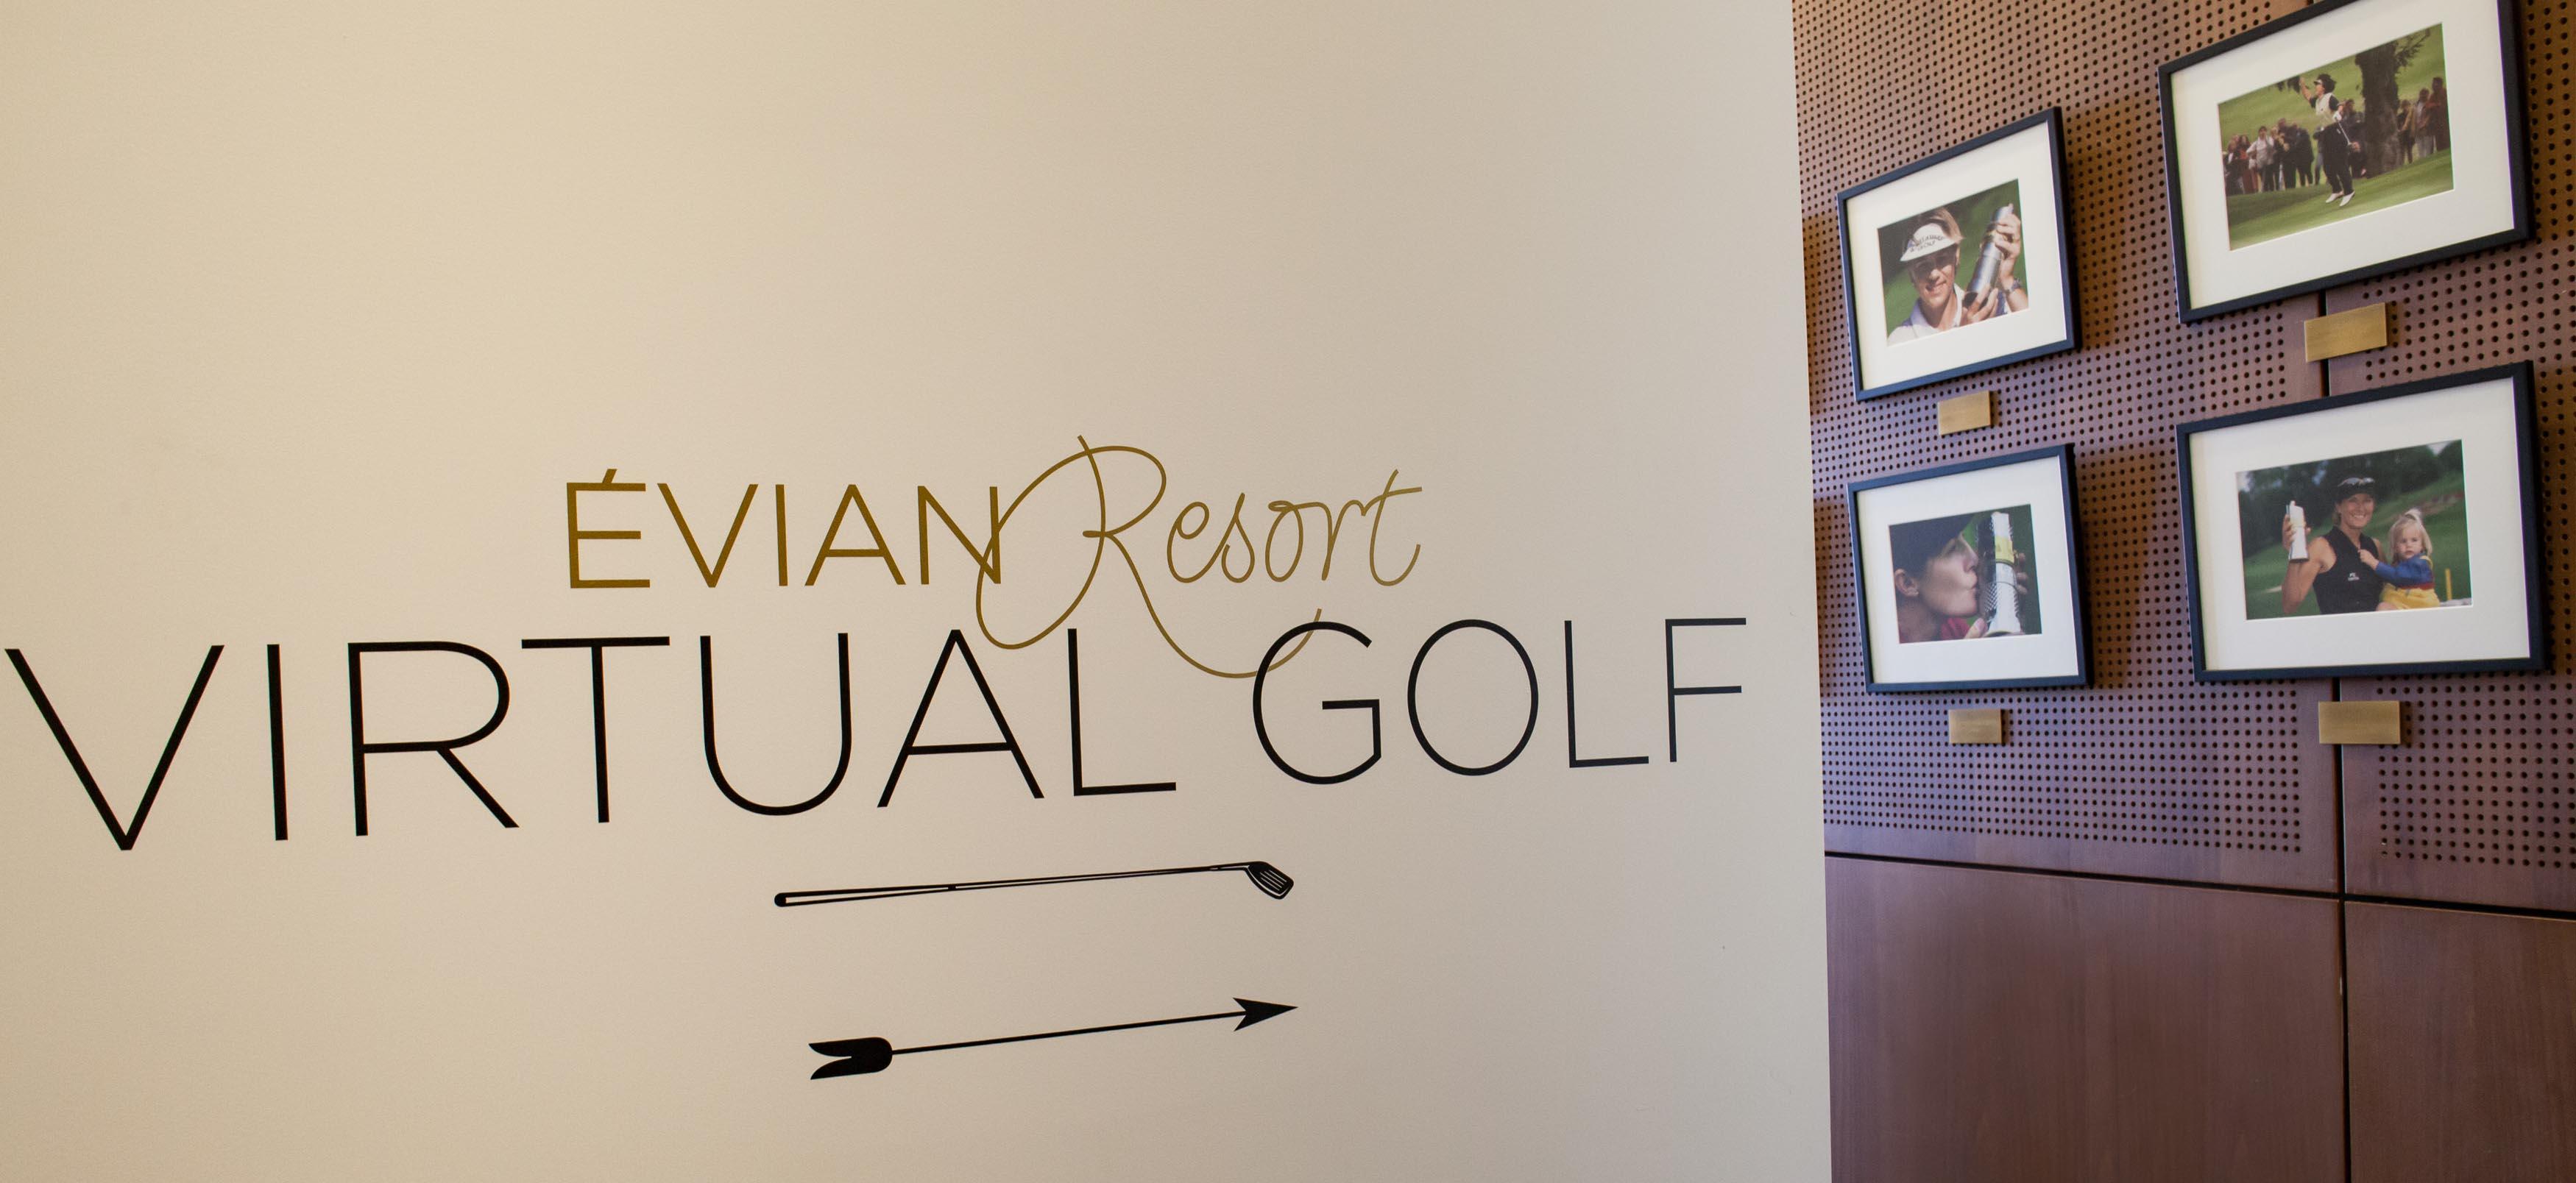 Indoor Golf Simulator At The Evian Resort With Golfzon